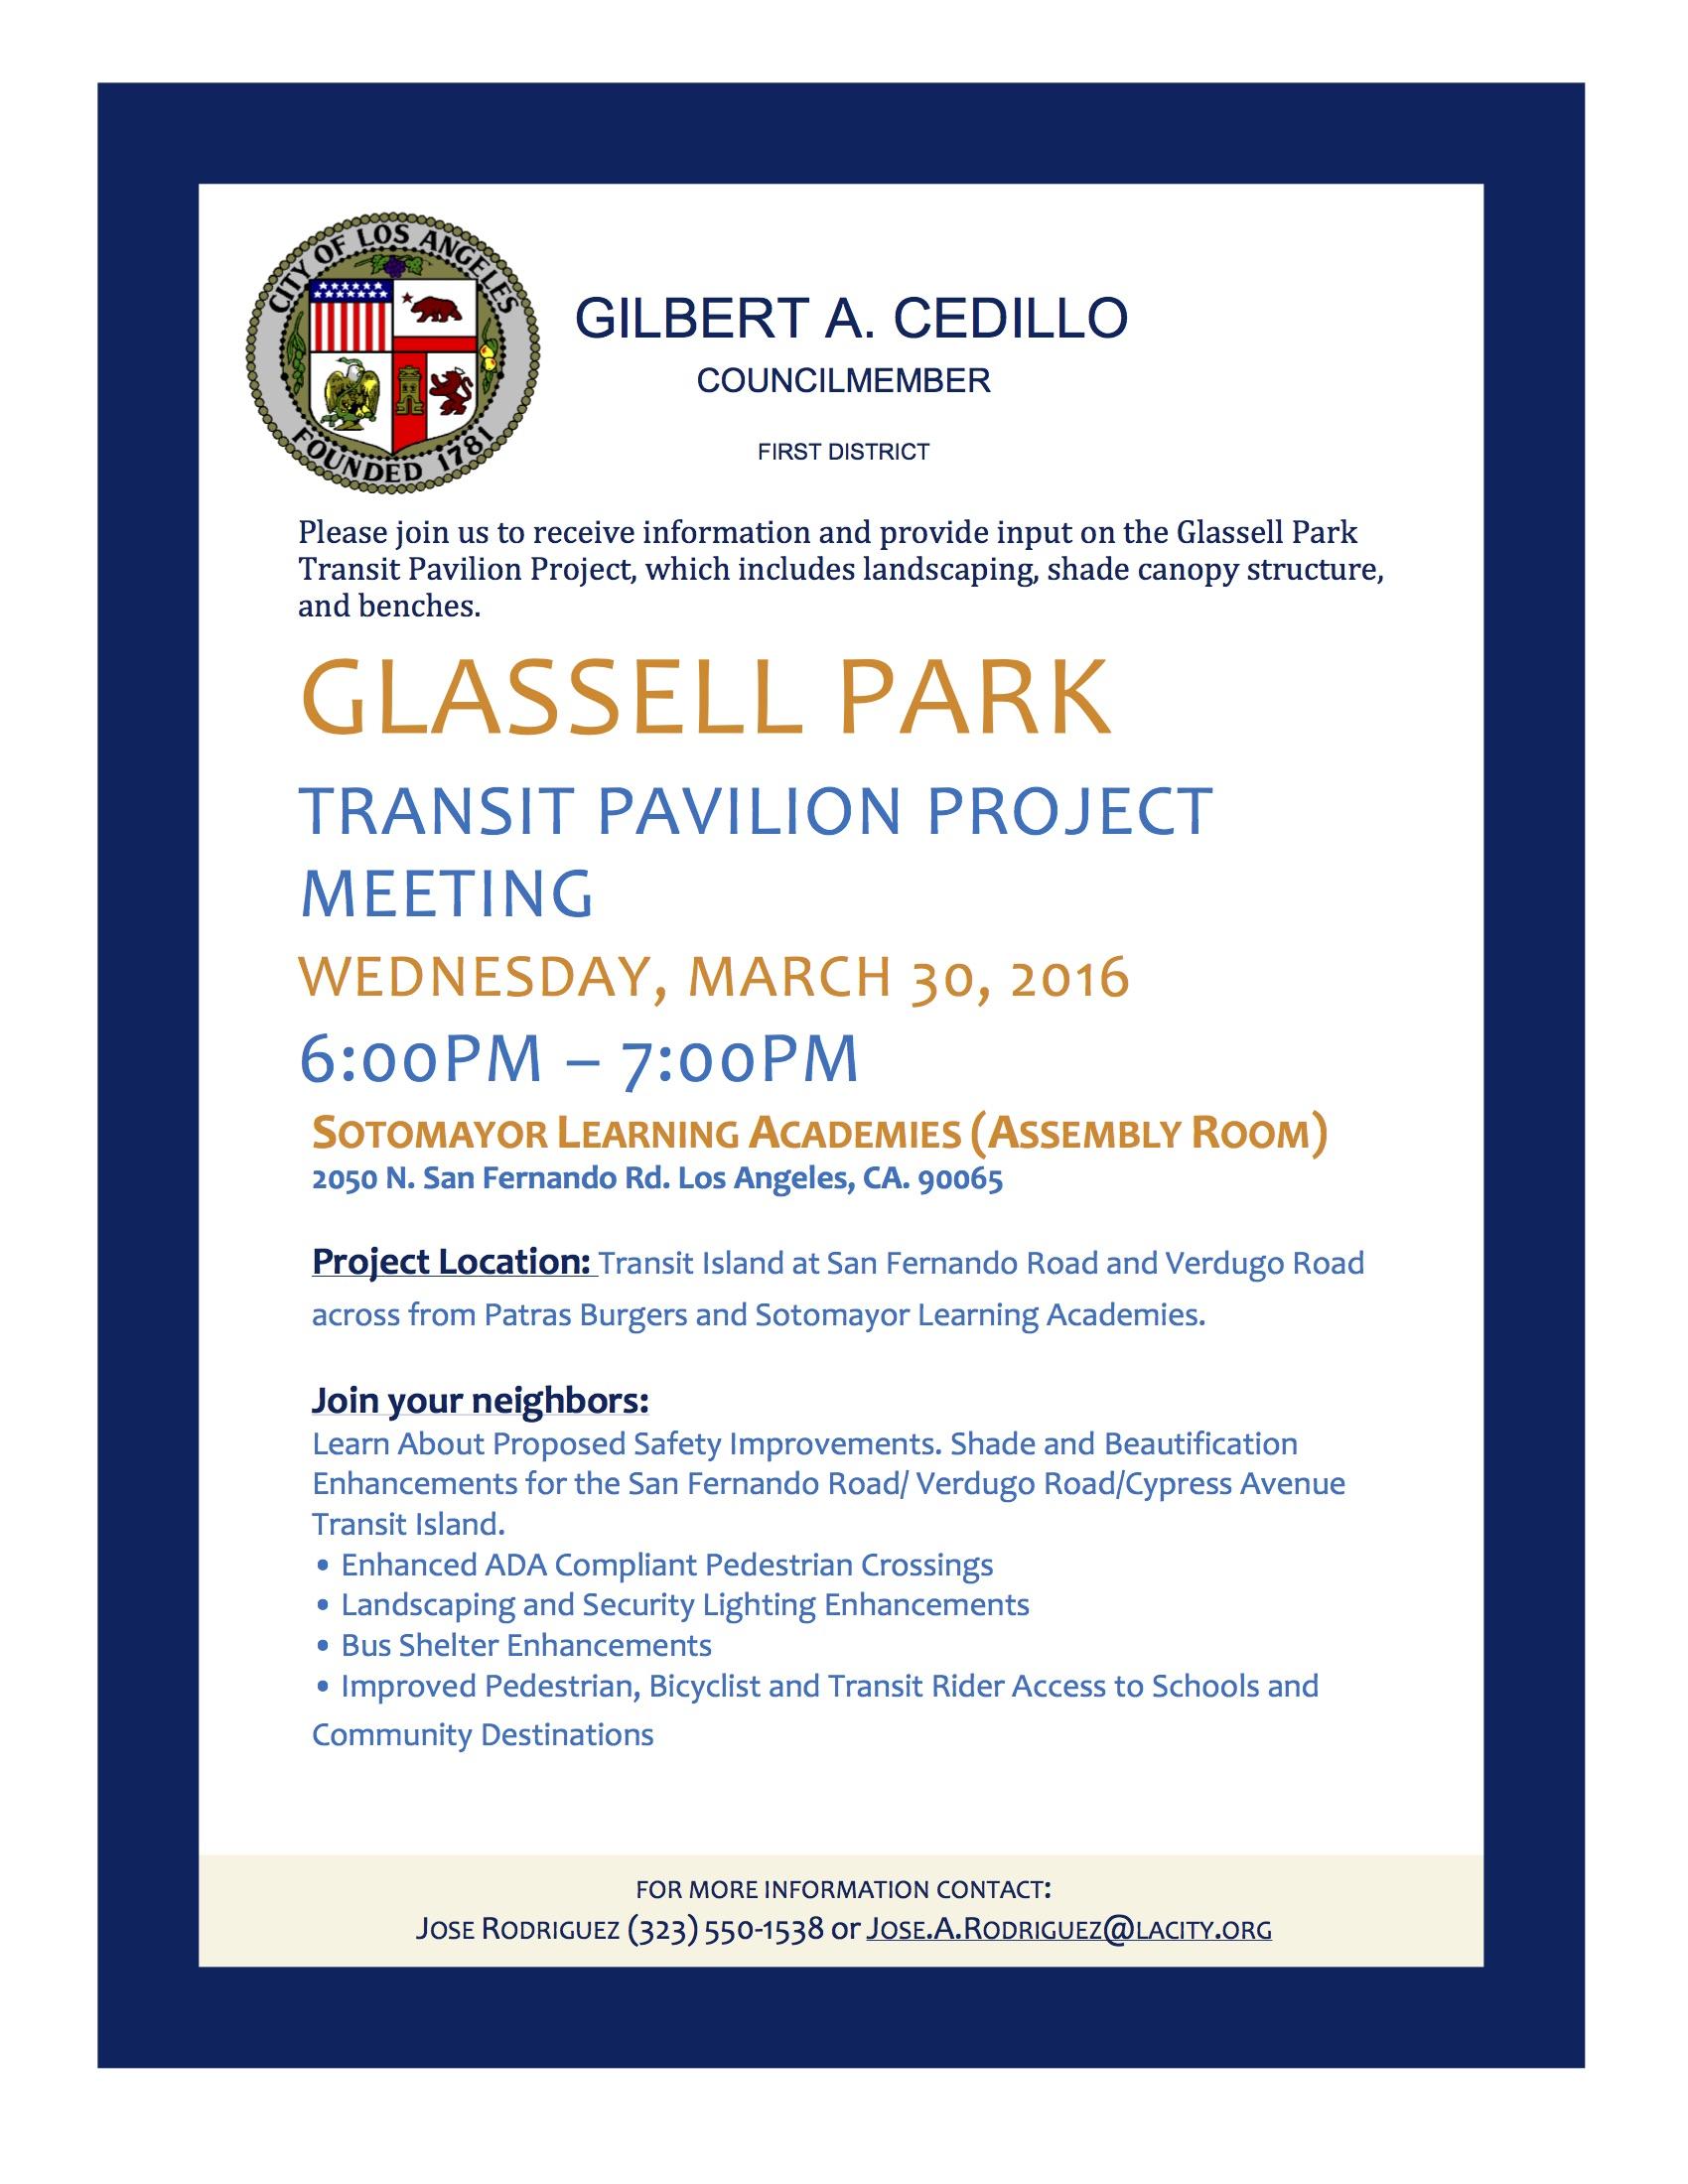 Glassell Park Transit Pavilion Project Cd1 Glassell Park